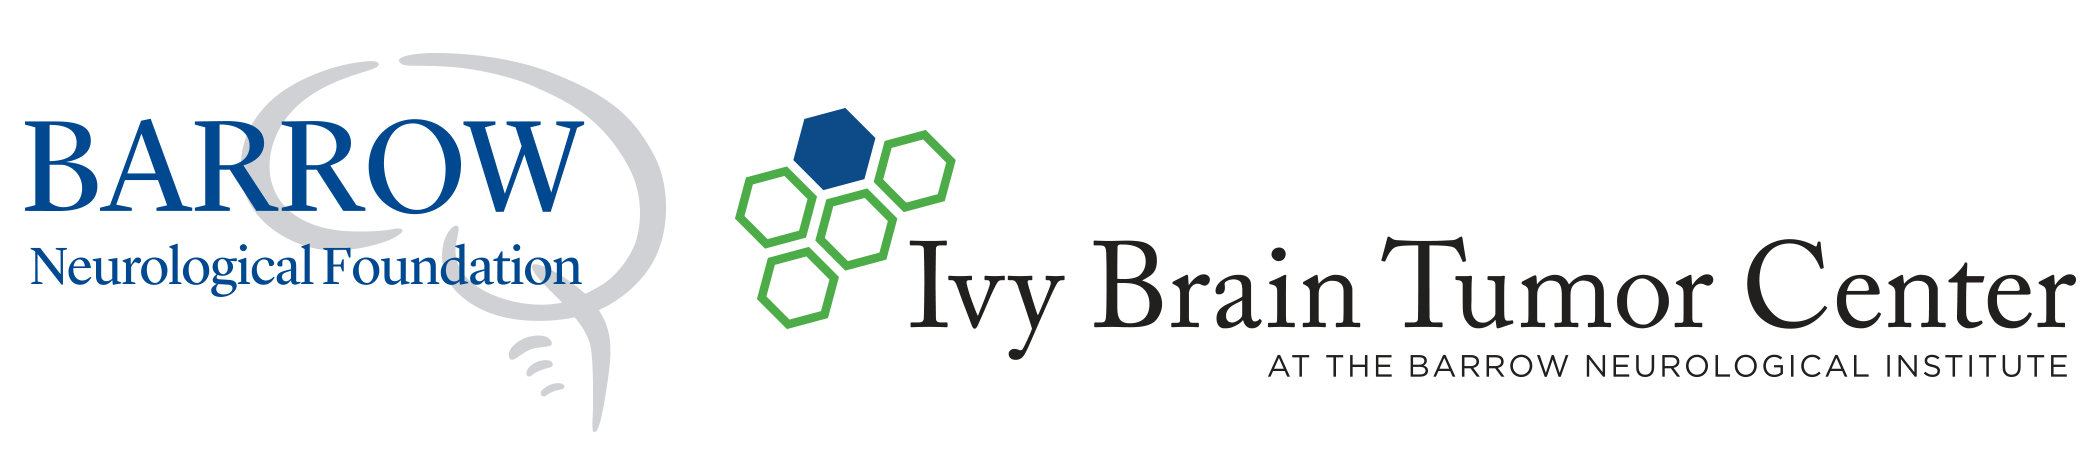 Barrow Neurological Foundation Ivy Brain Tumor Center logo